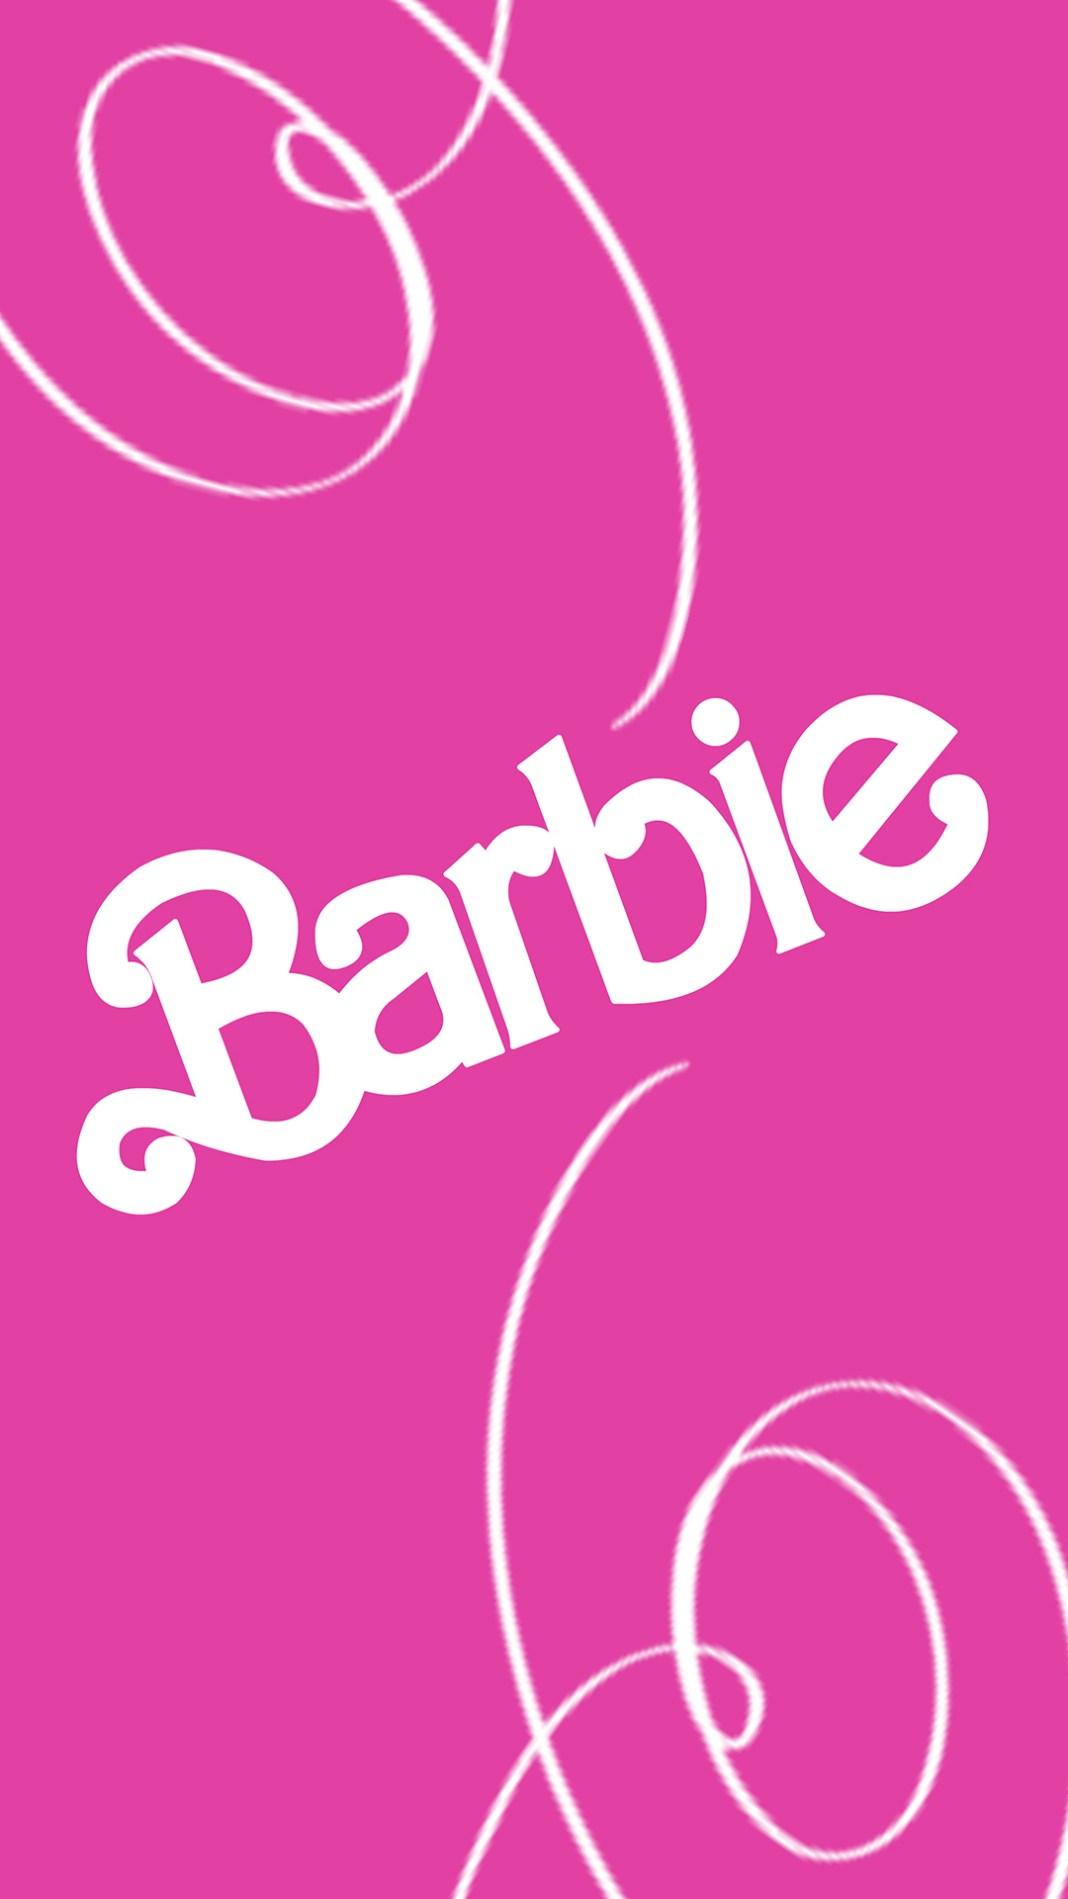 barbie-5587